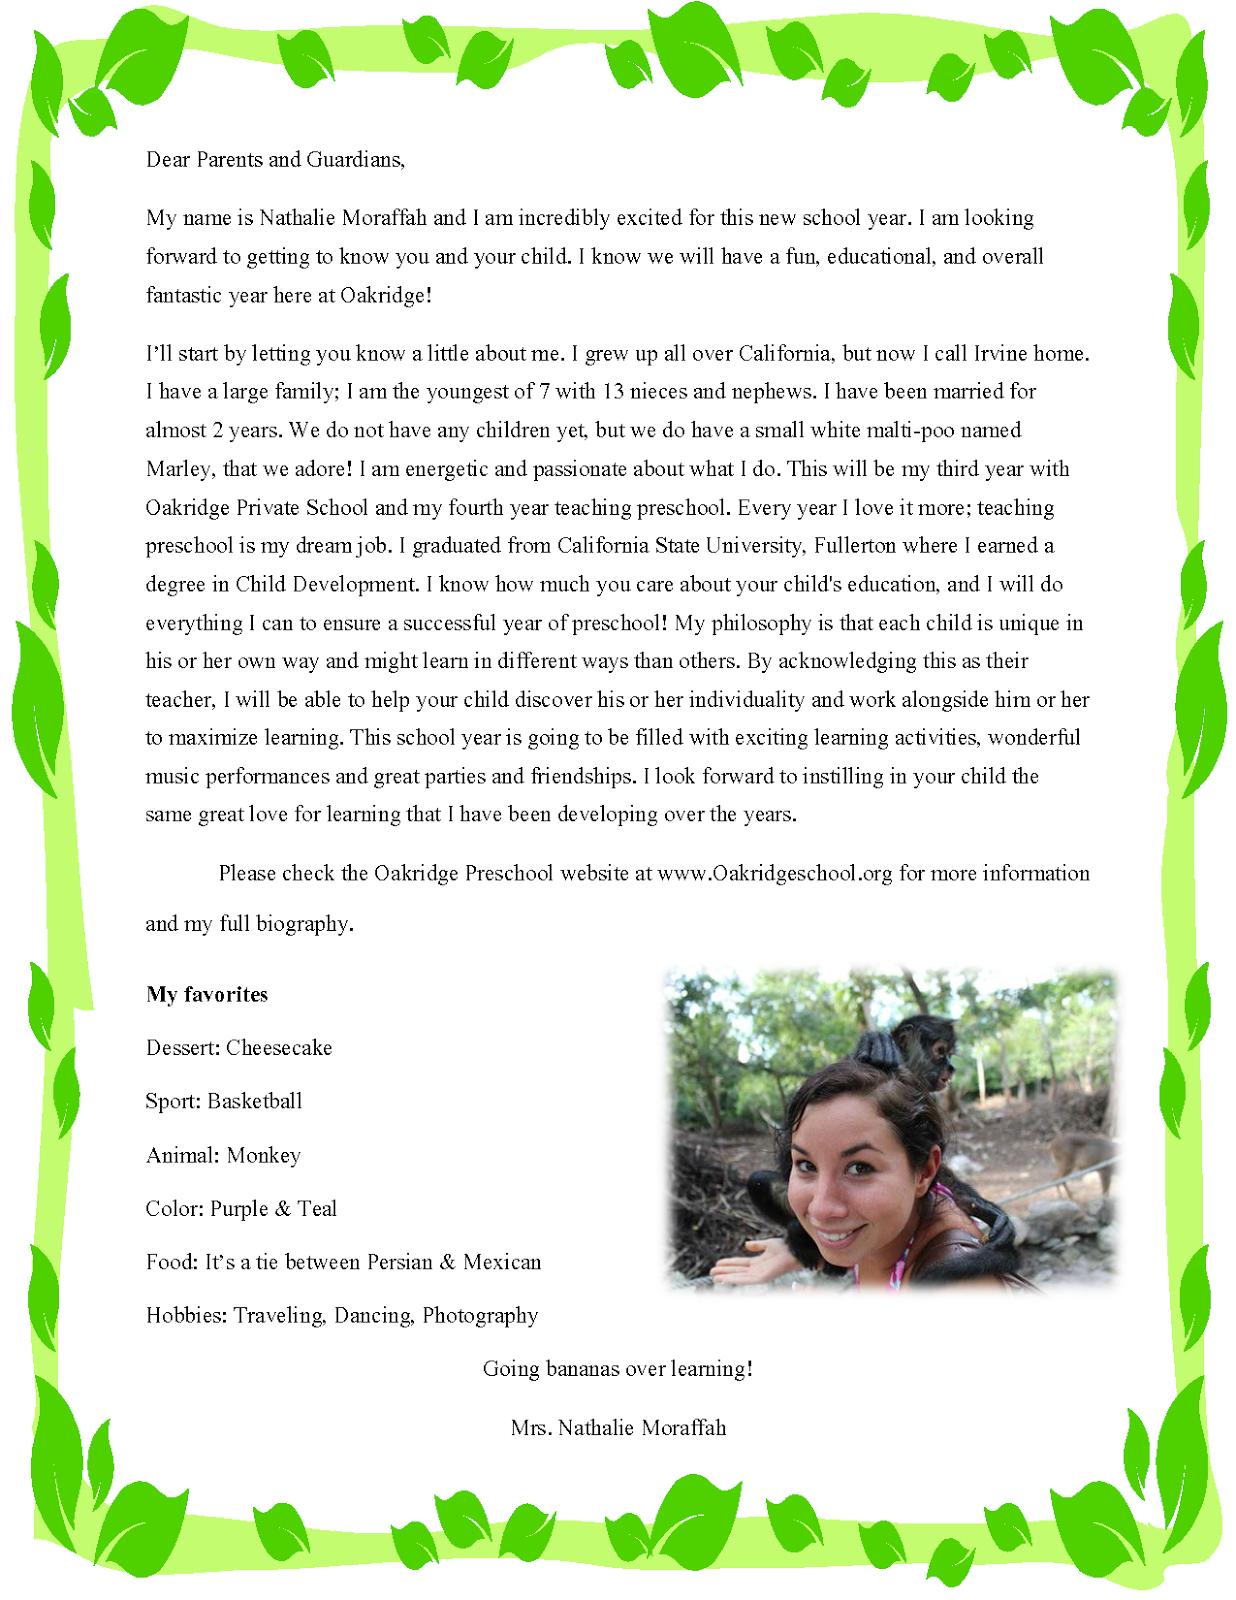 Sample Letters to Parents - Meet the teacher letter for parents